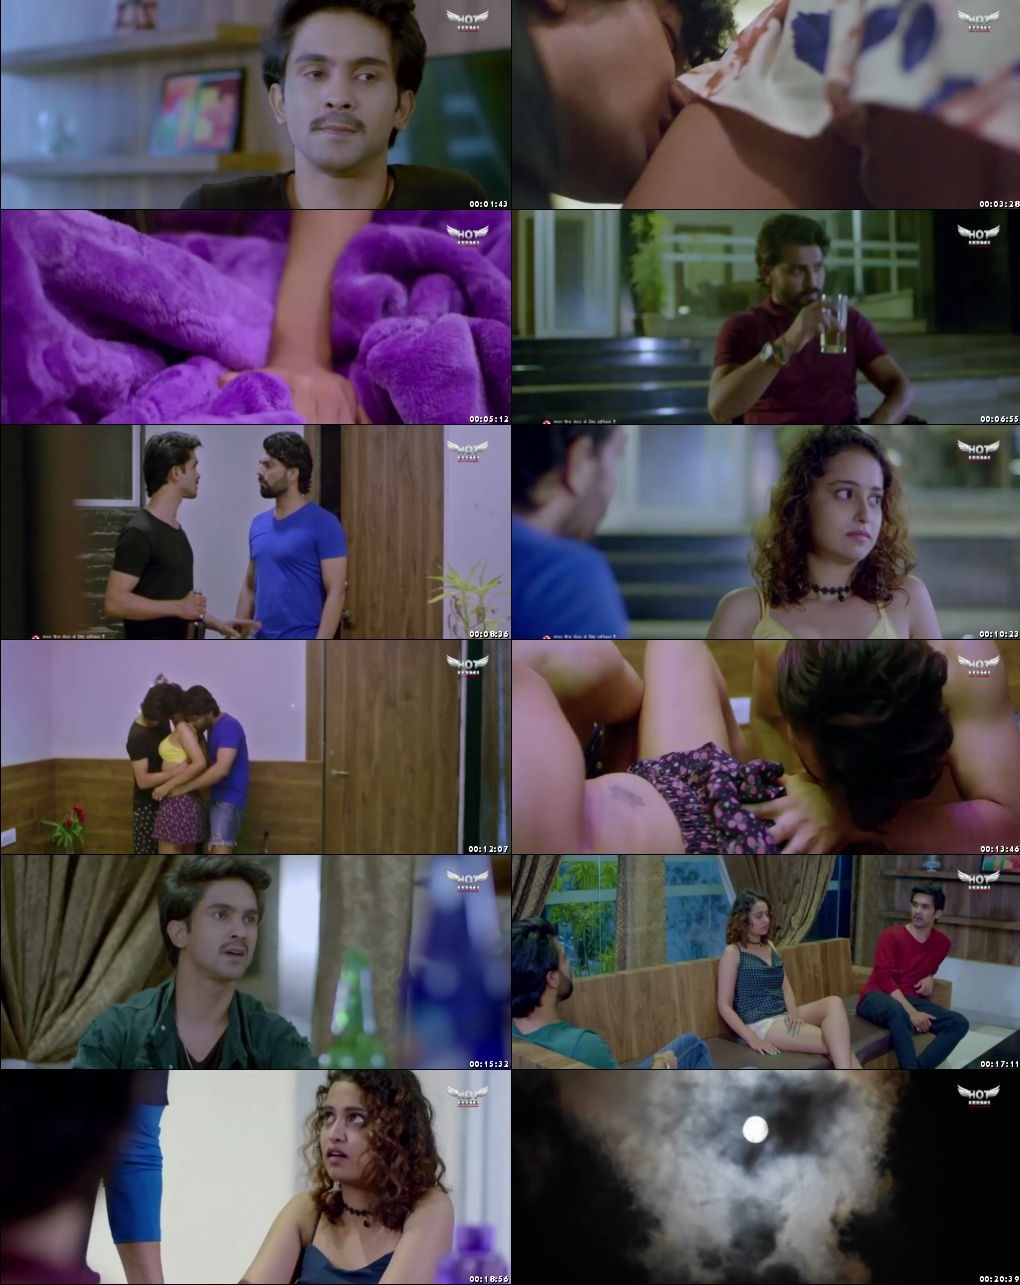 Lockdown 2.0 (2020) Full Hindi Episode Online Watch